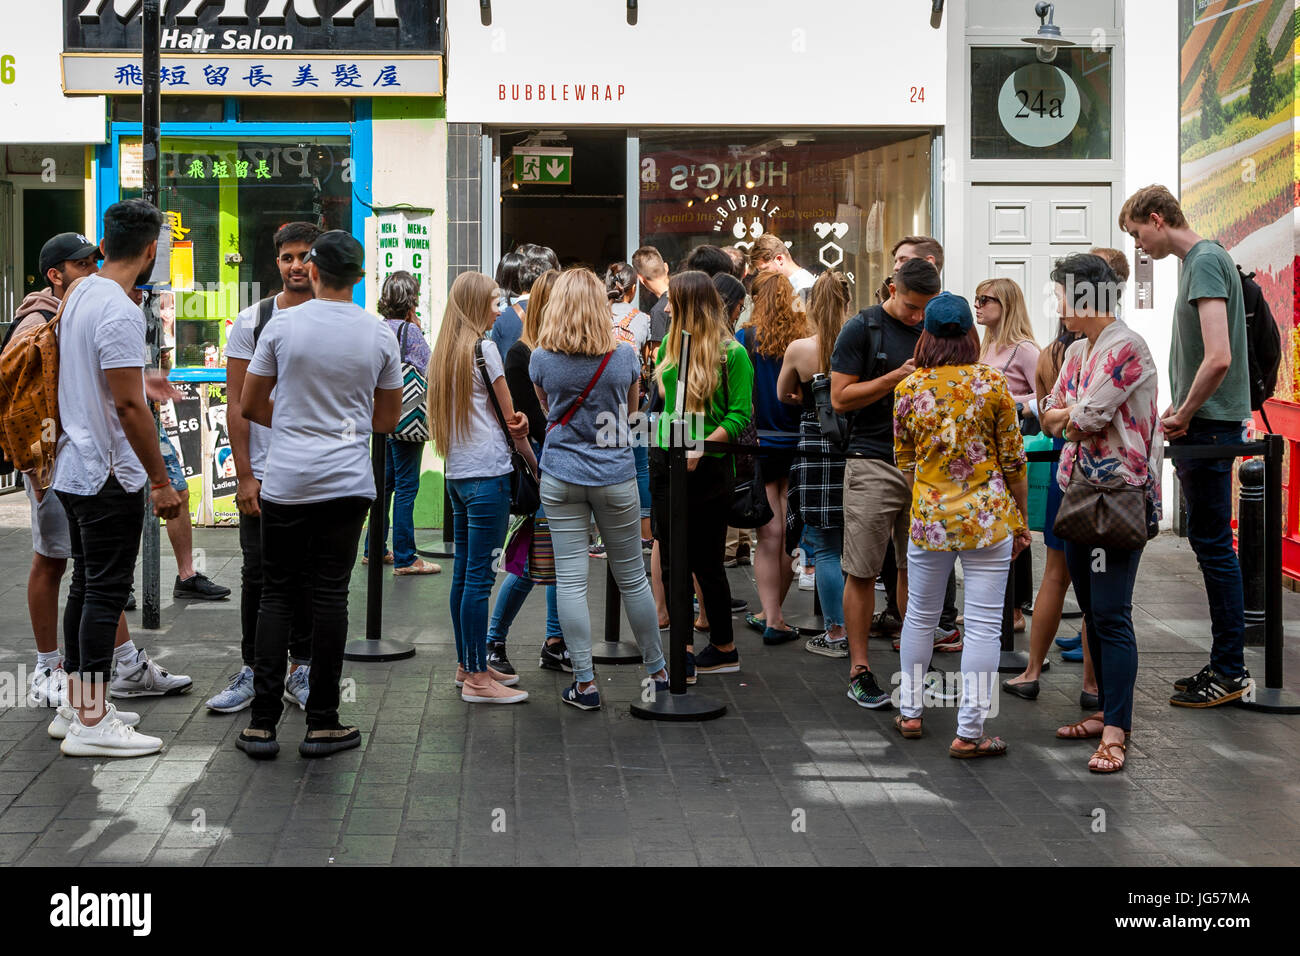 People Queueing Outside The Bubble Wrap Waffle Store, Wardour Street, Chinatown, London, UK Stock Photo